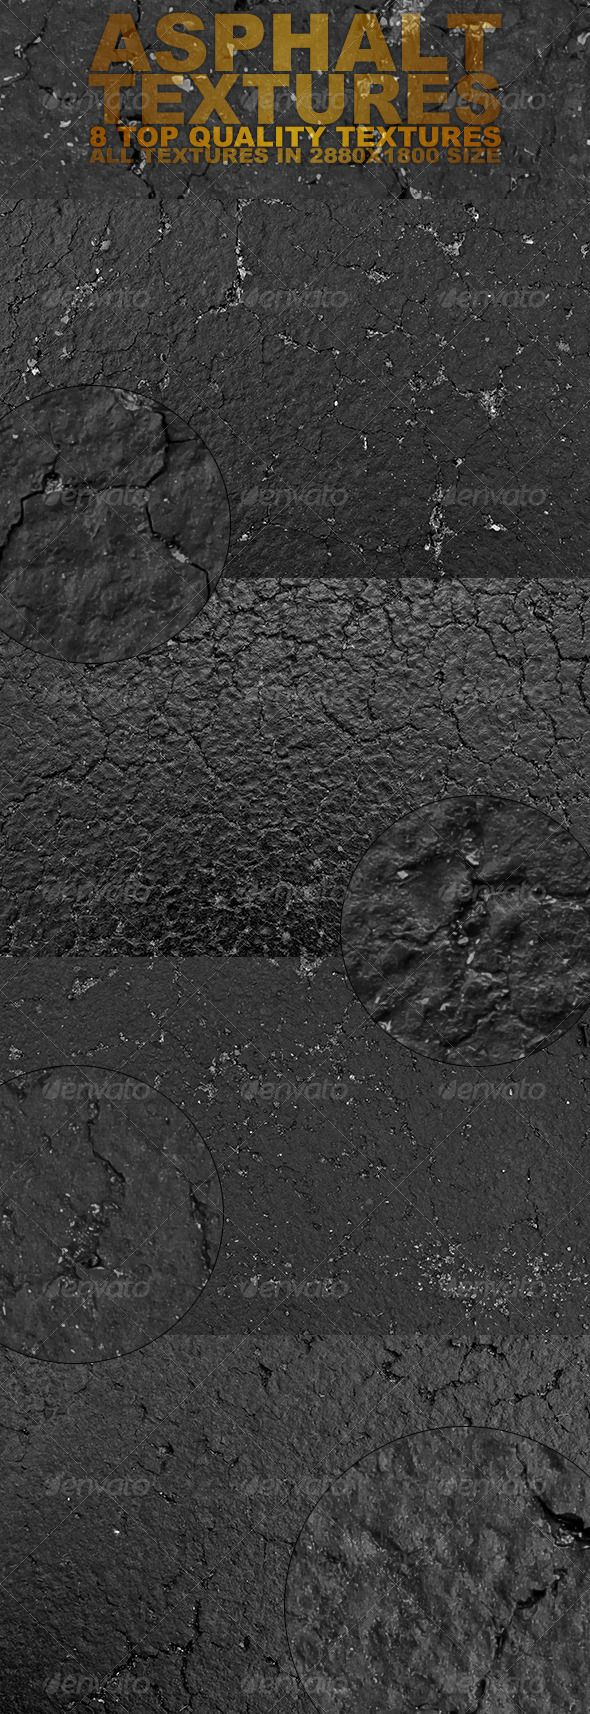 Black Asphalt Textures — Photoshop PSD #asphalt #high quality textures • Available here → https://graphicriver.net/item/black-asphalt-textures/2813211?ref=pxcr